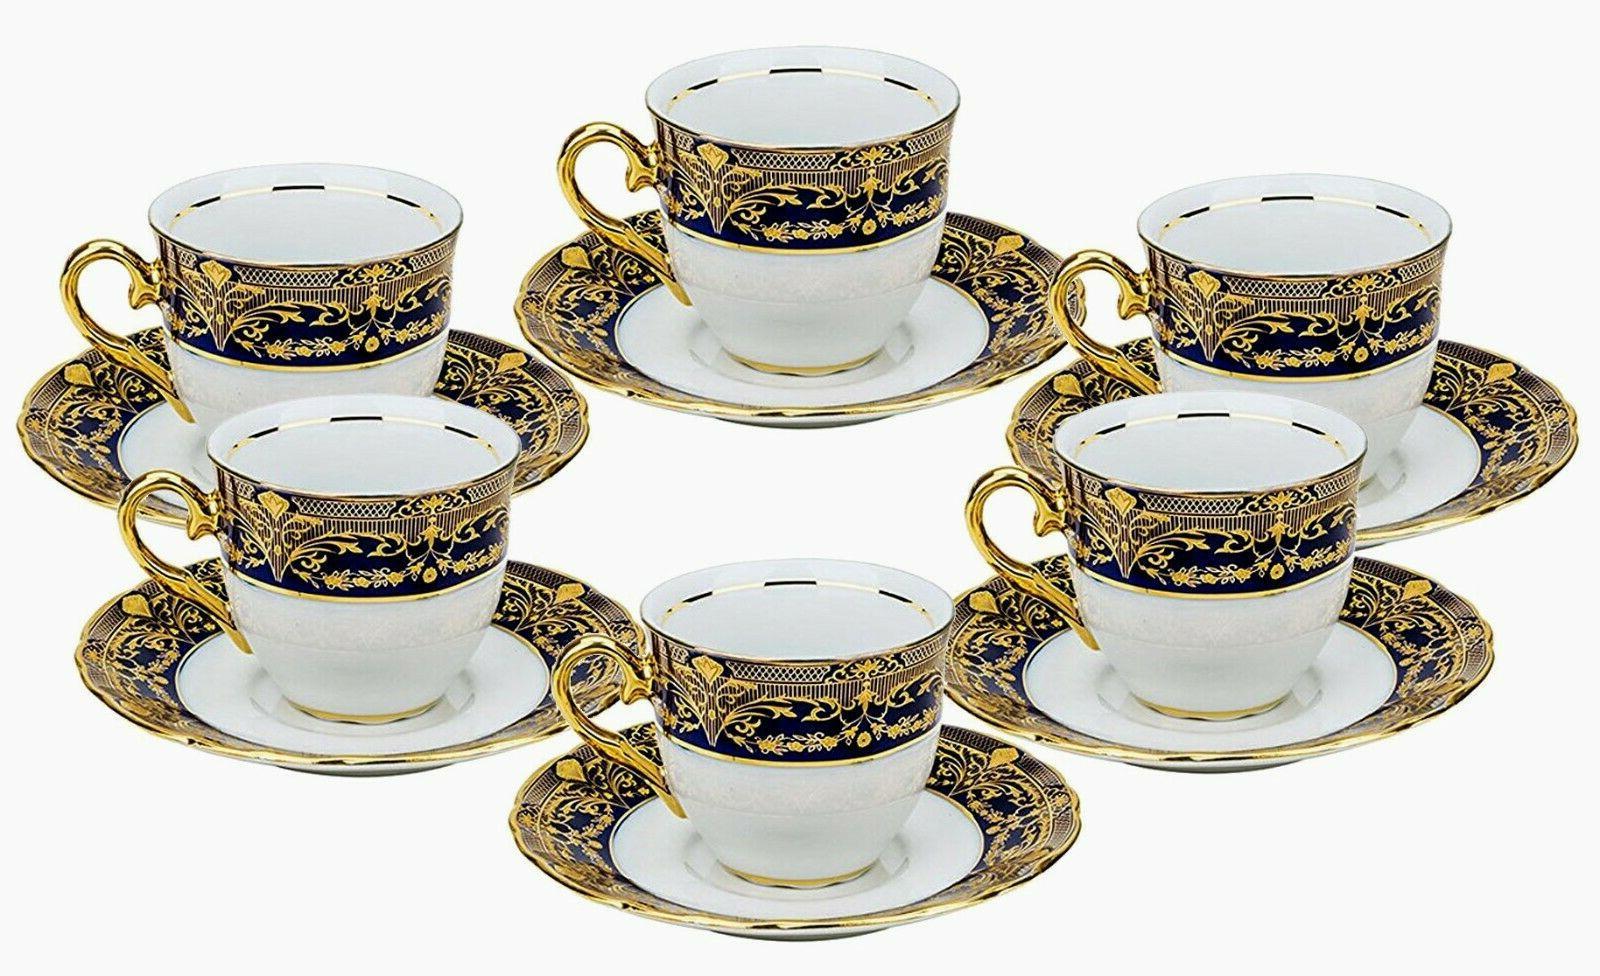 Euro Porcelain 12-pc Cup for 6 Blue 24K Gold